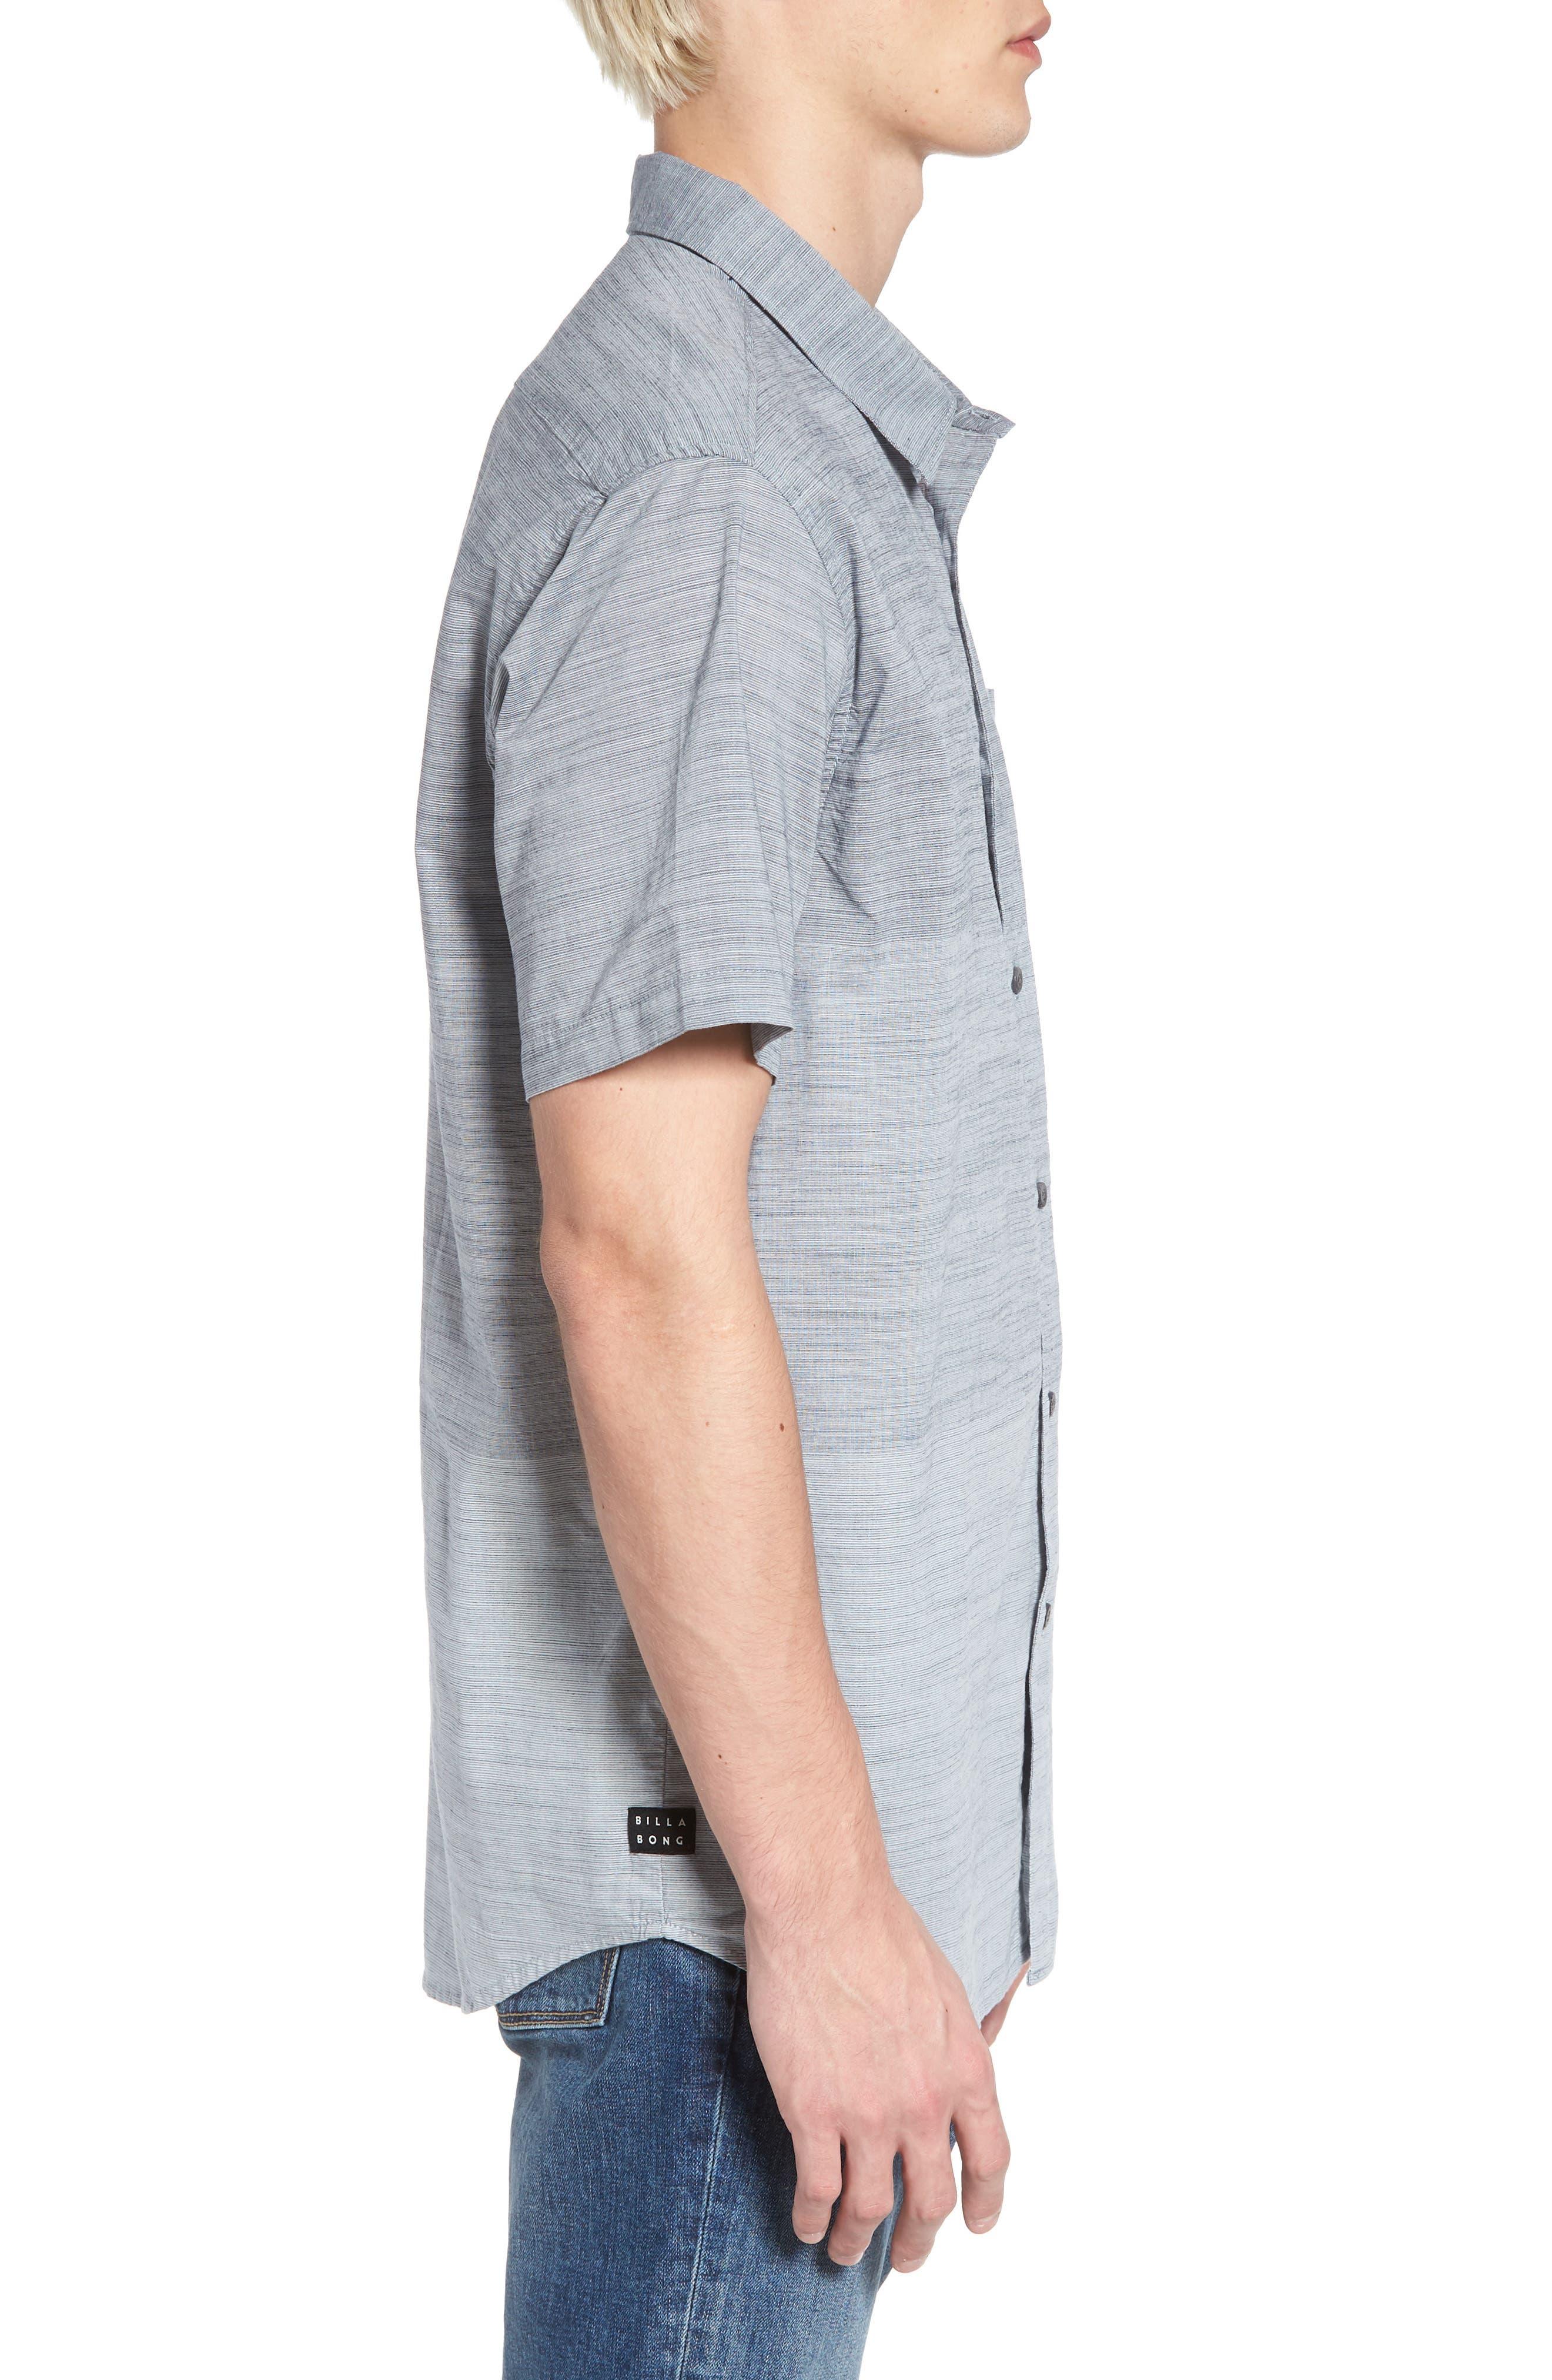 Faderade Short Sleeve Shirt,                             Alternate thumbnail 3, color,                             Blue